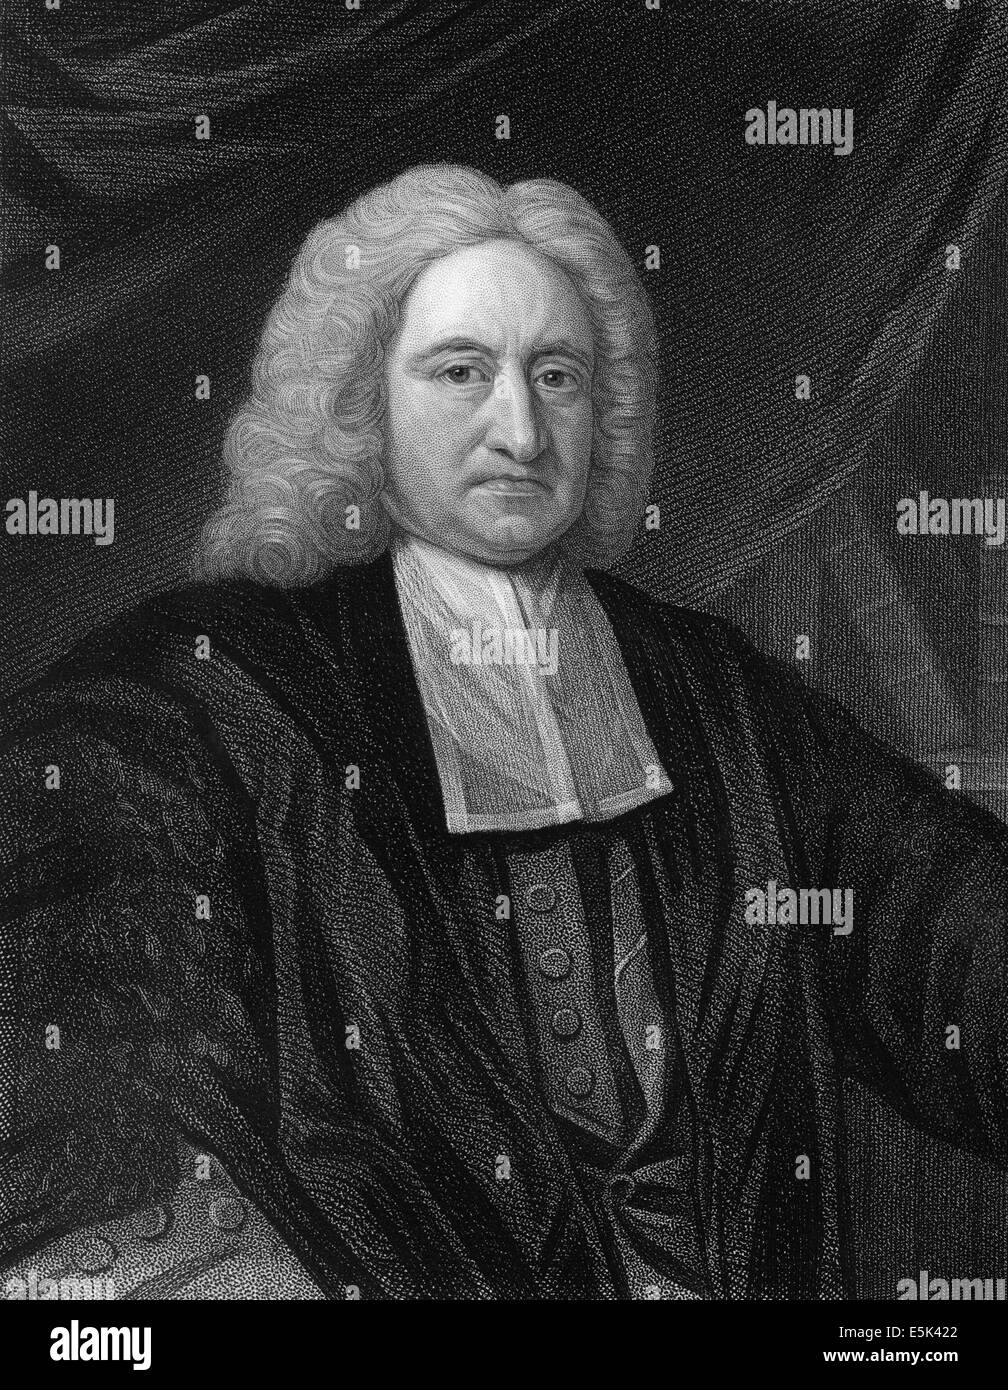 Edmond Halley, 1656 - 1742, an English astronomer, geophysicist, mathematician, meteorologist, - Stock Image